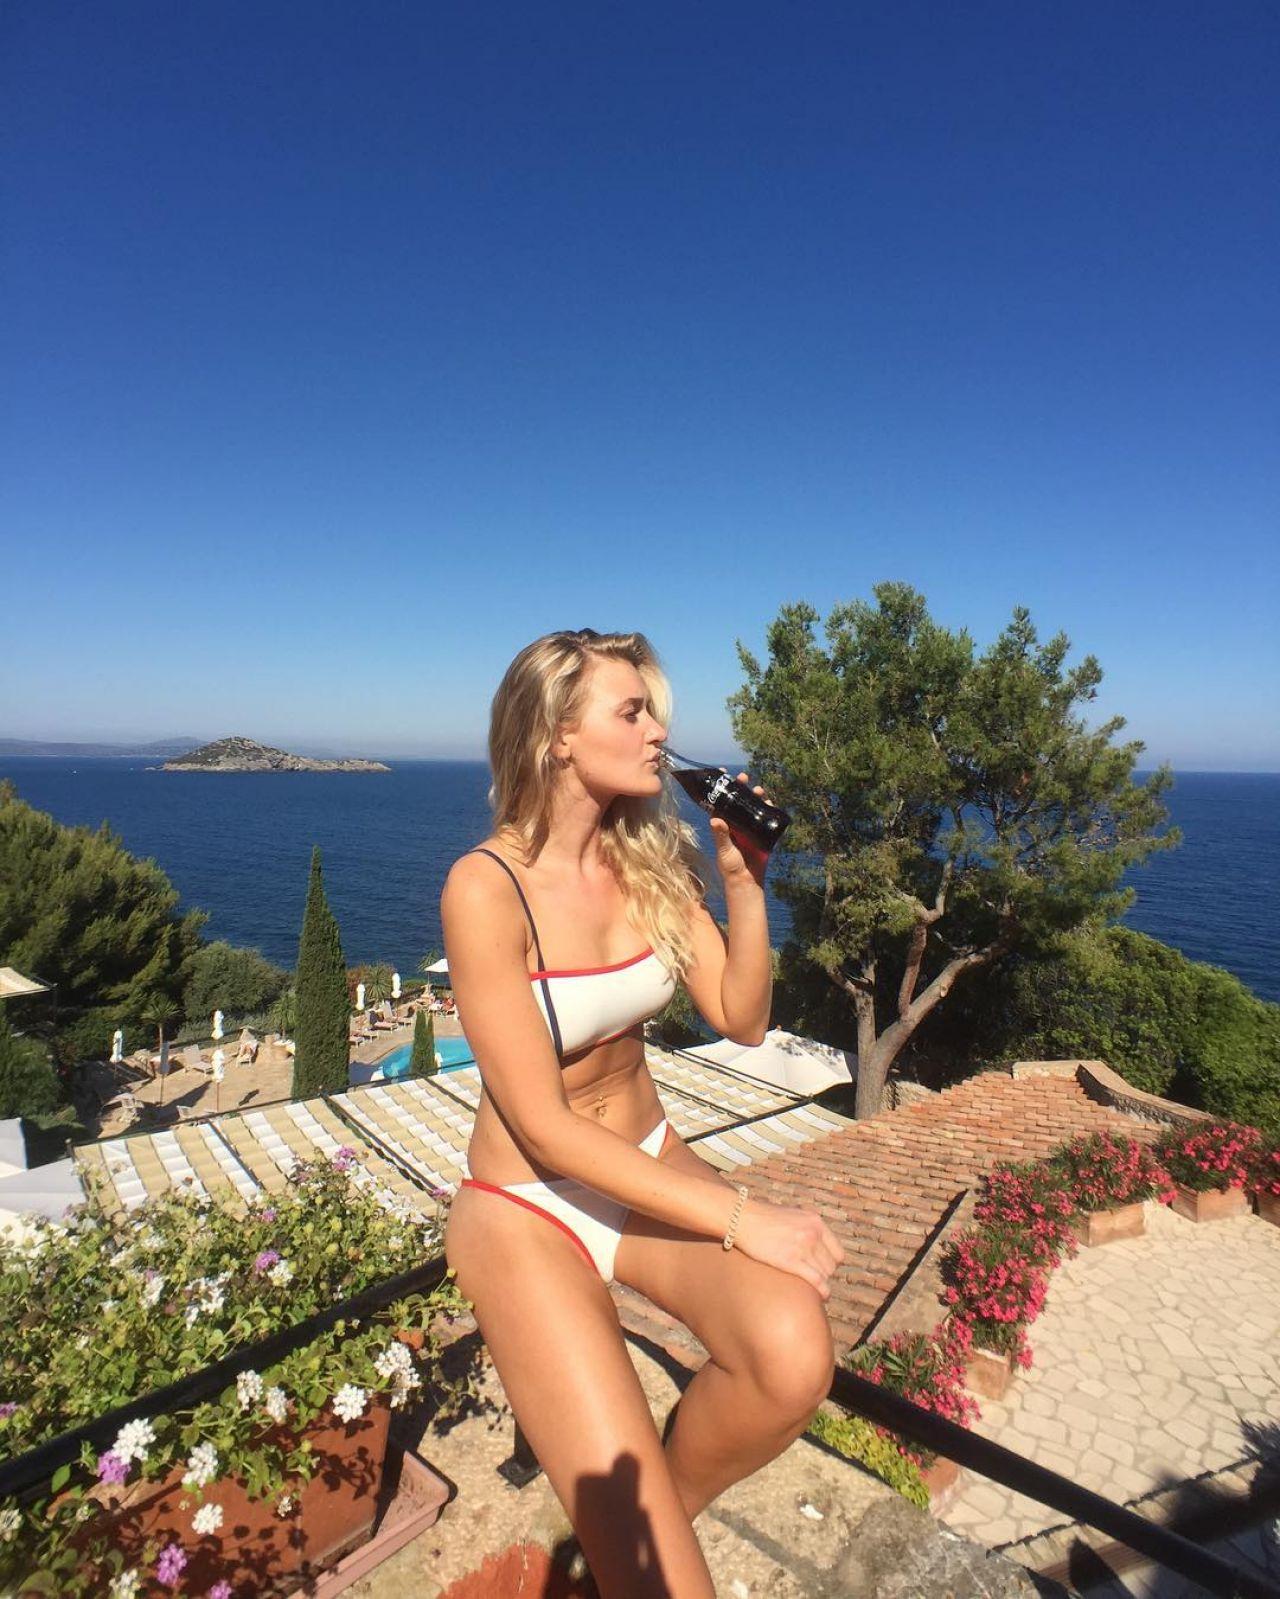 Bikini AJ Michalka nude (86 photo), Fappening